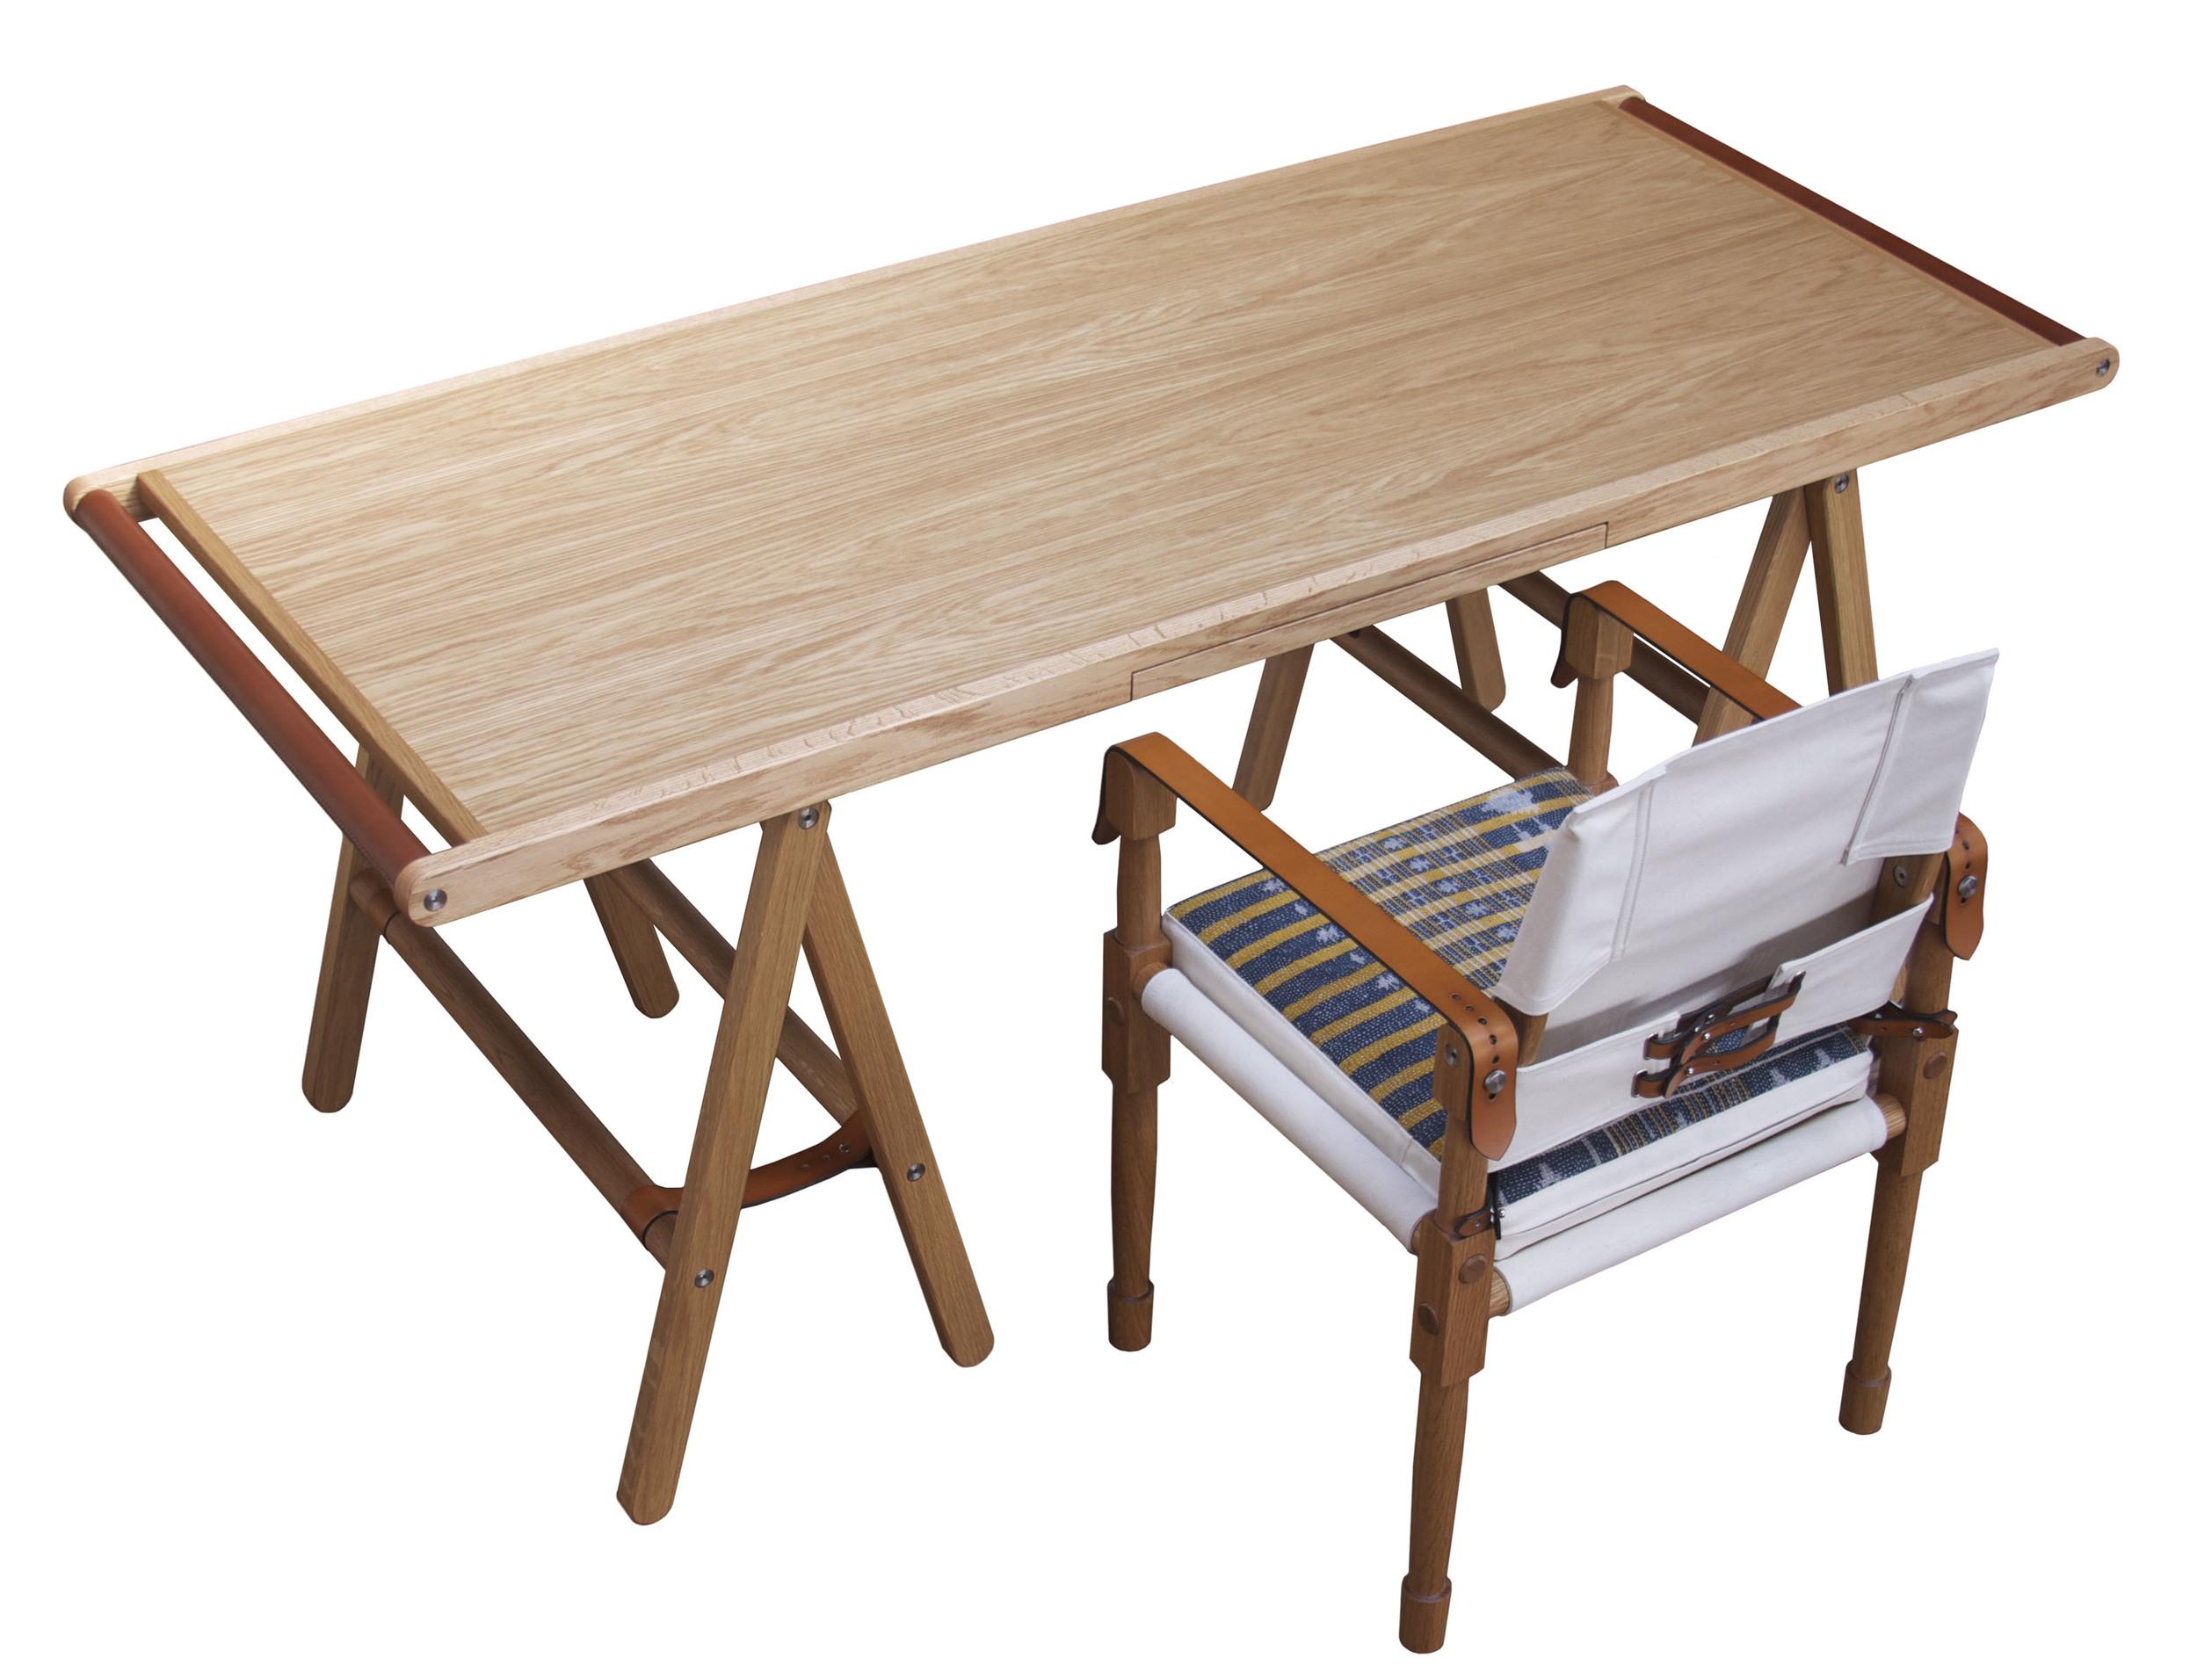 Danziger Table in white oak - oiled